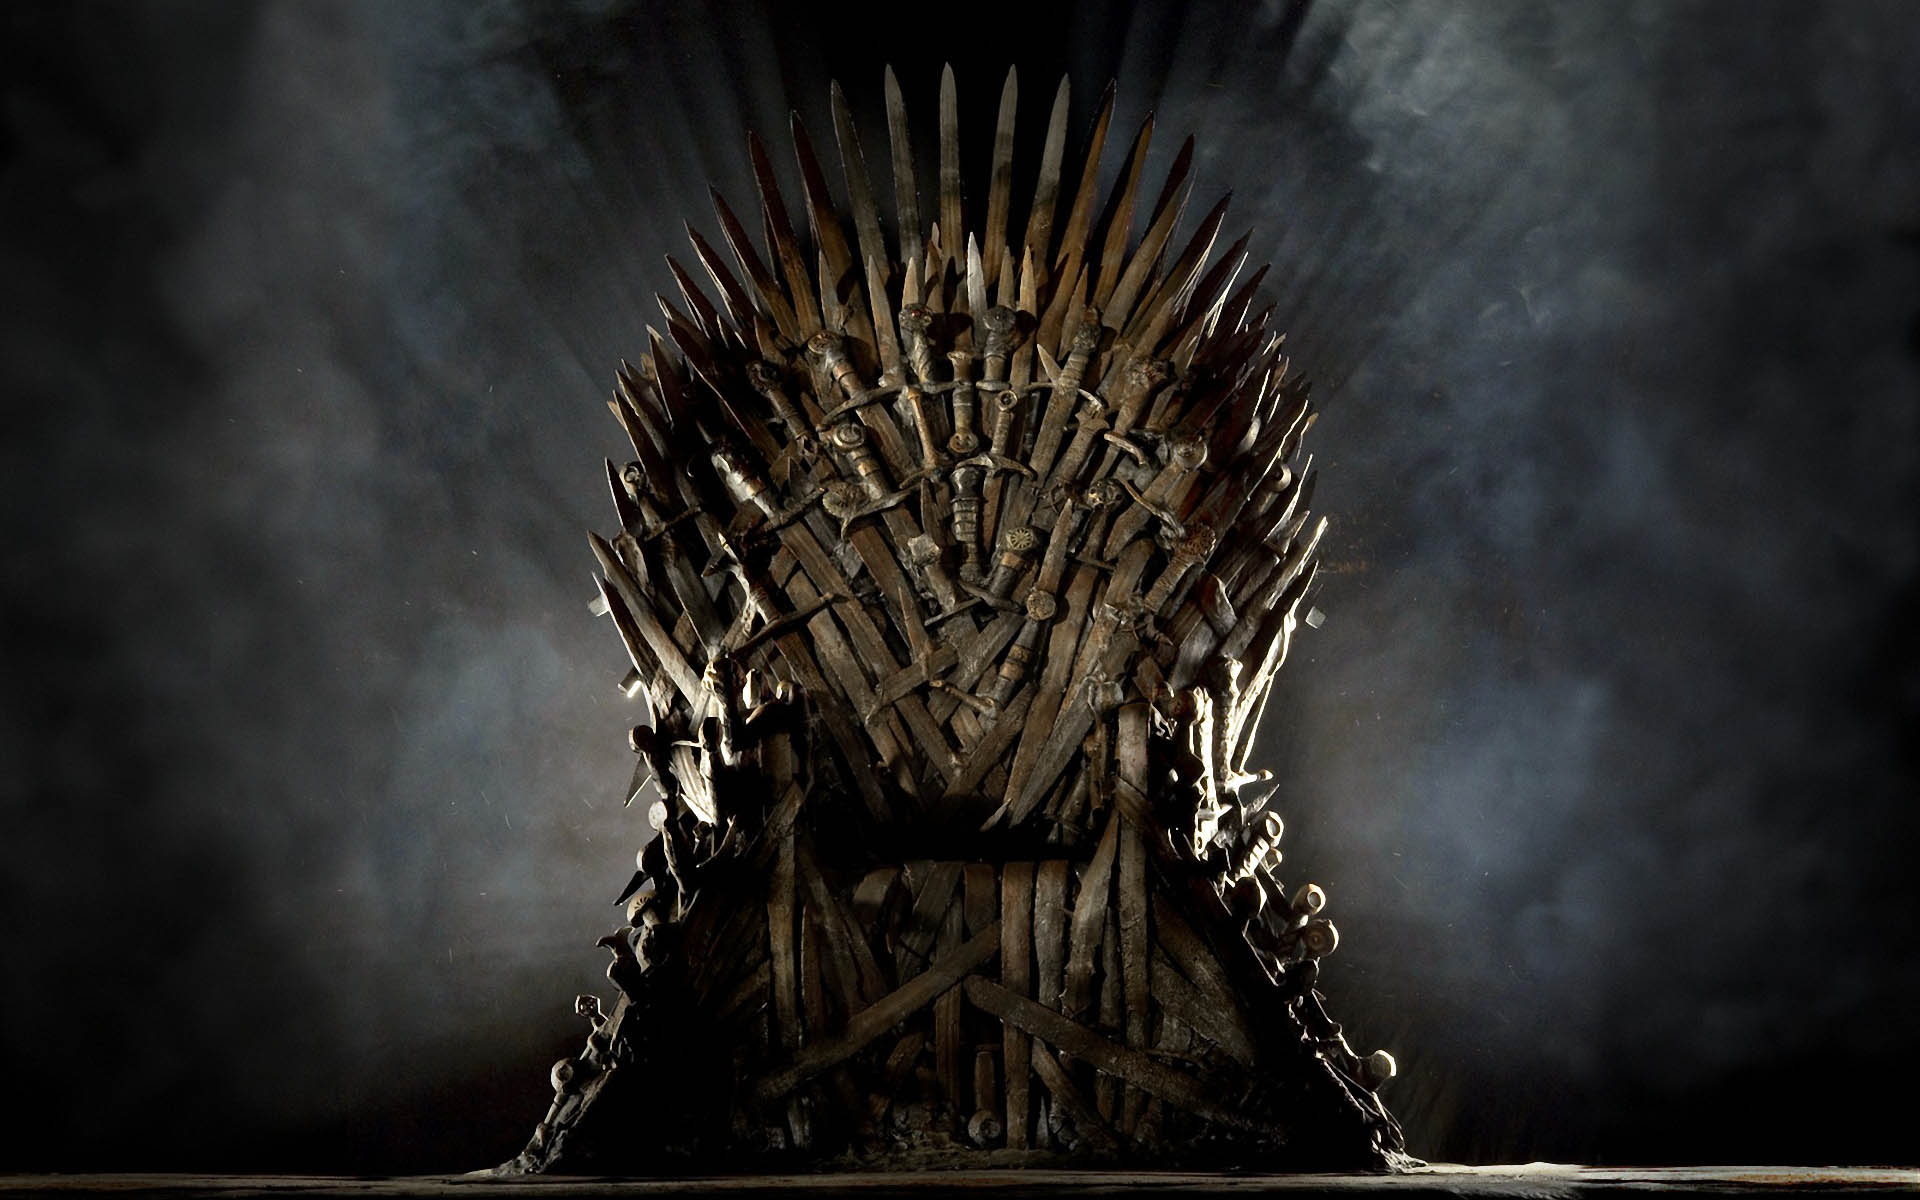 game-of-thrones-saison-5-documentaire